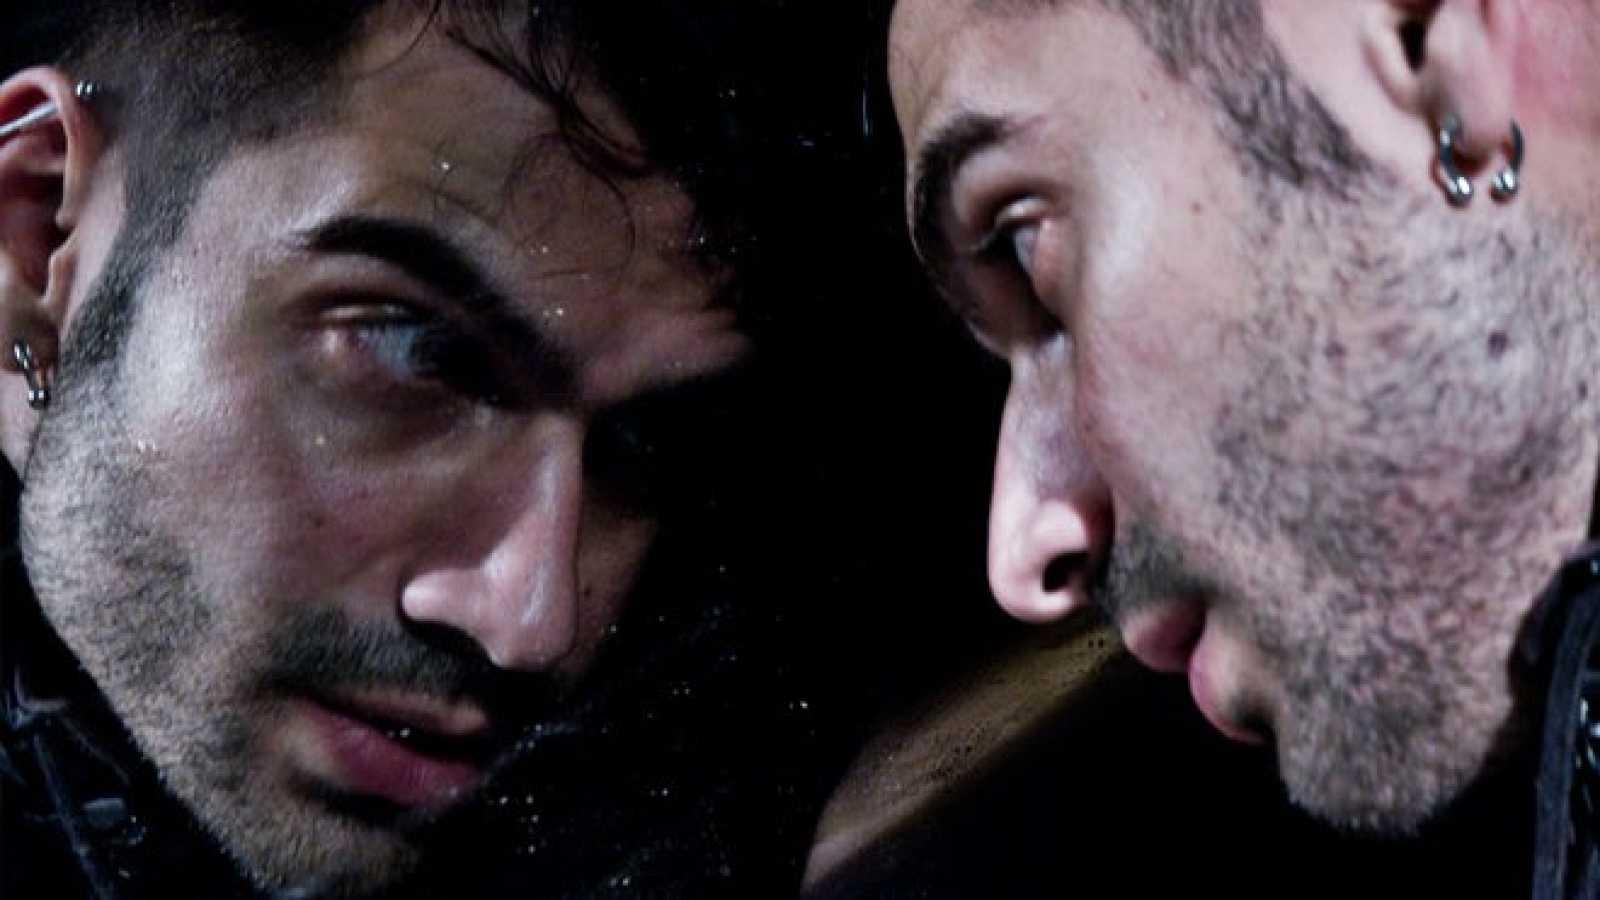 La sala - Un Koltès en manos de César Barló y José Gonçalo Pais - 21/03/21 - Escuchar ahora